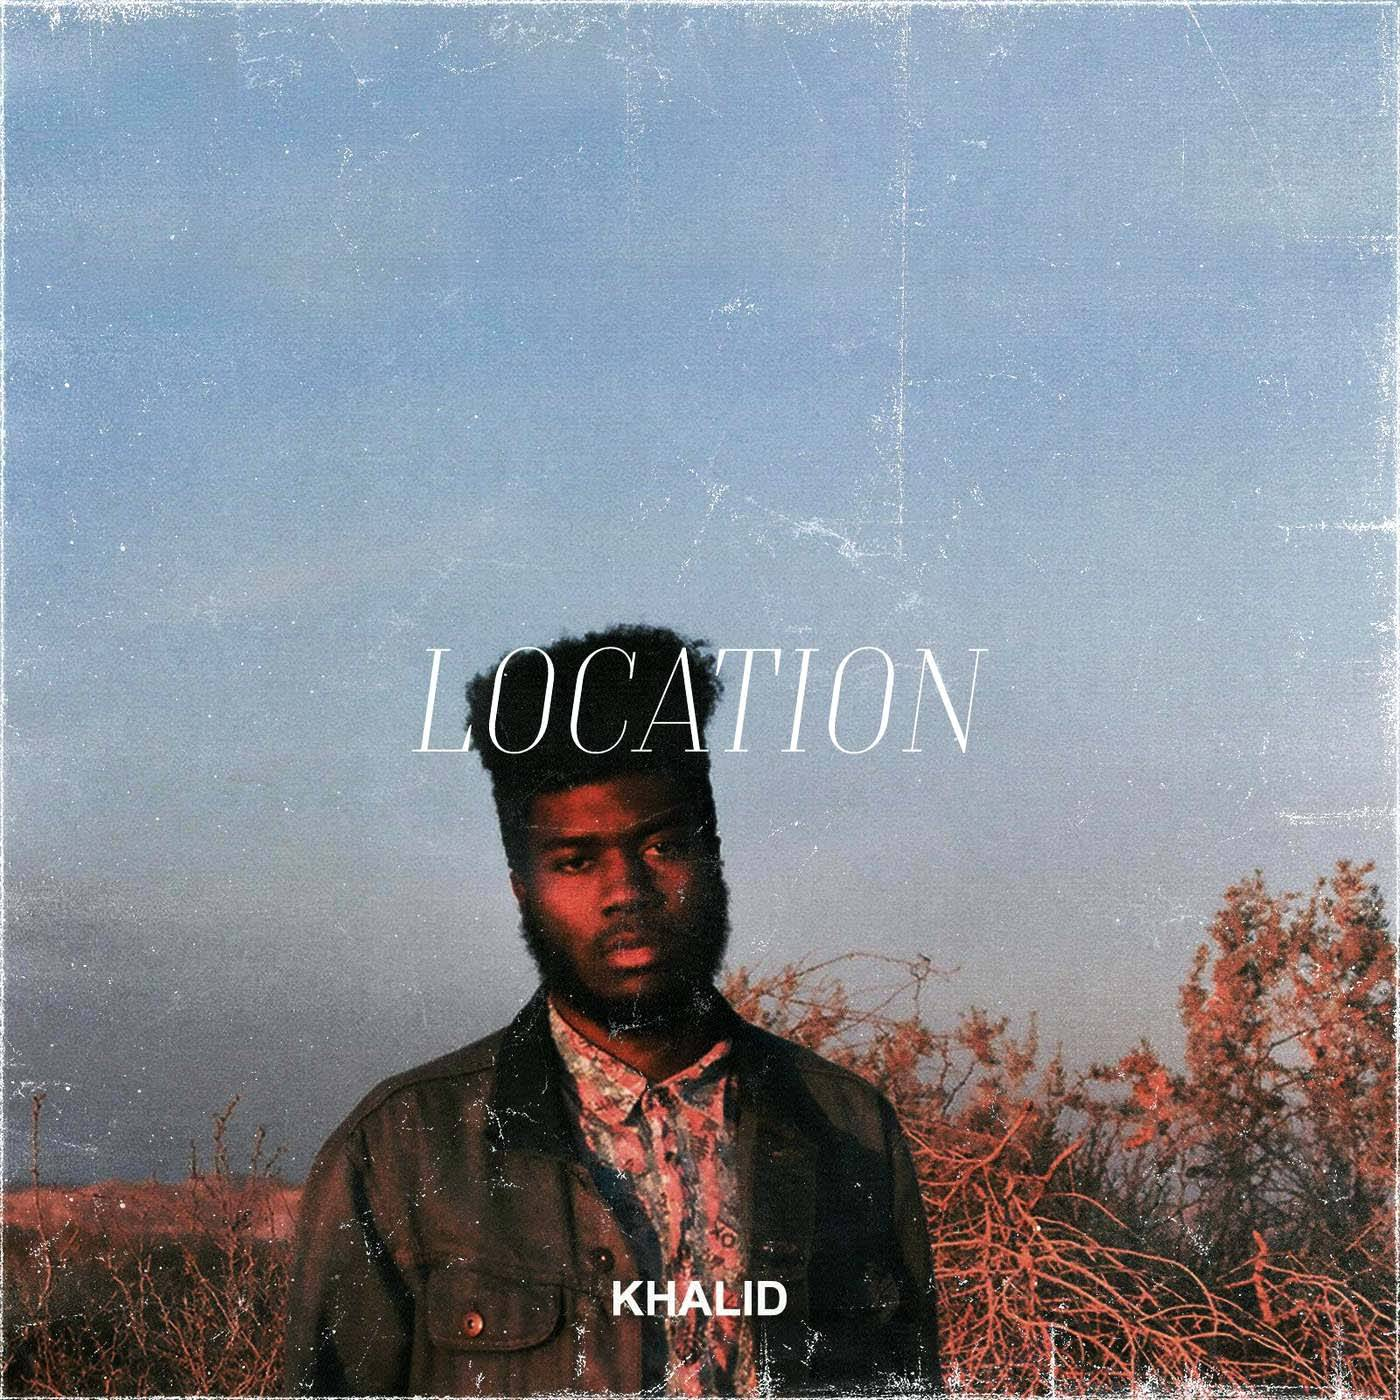 KHALID ? LOCATION - (Photo: RCA)